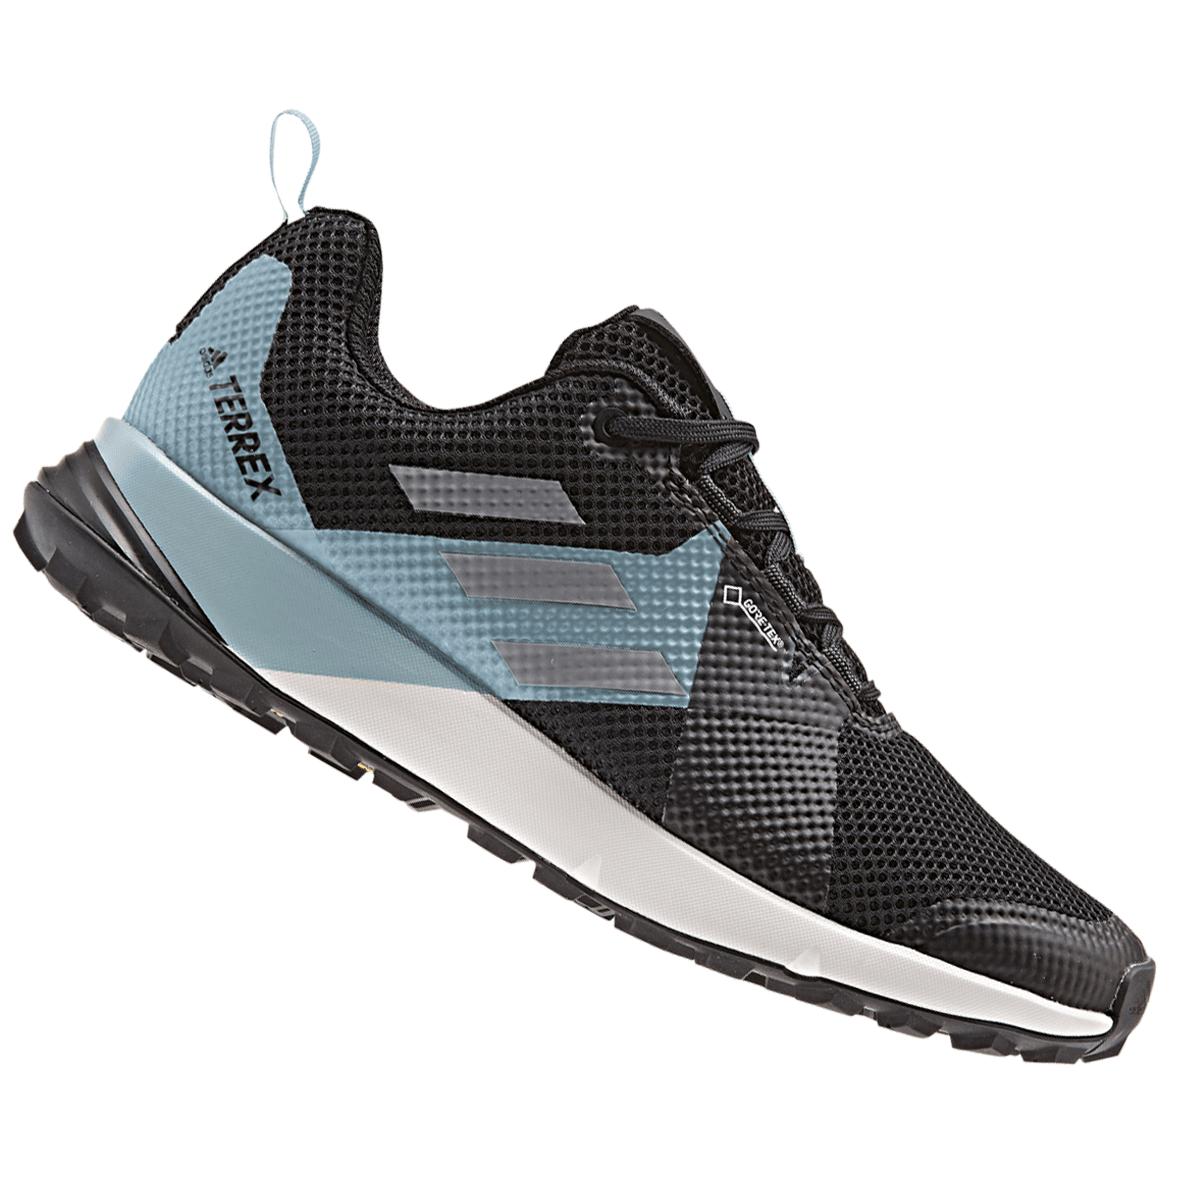 adidas Damen Schuh Terrex Two GTX schwarz/blau